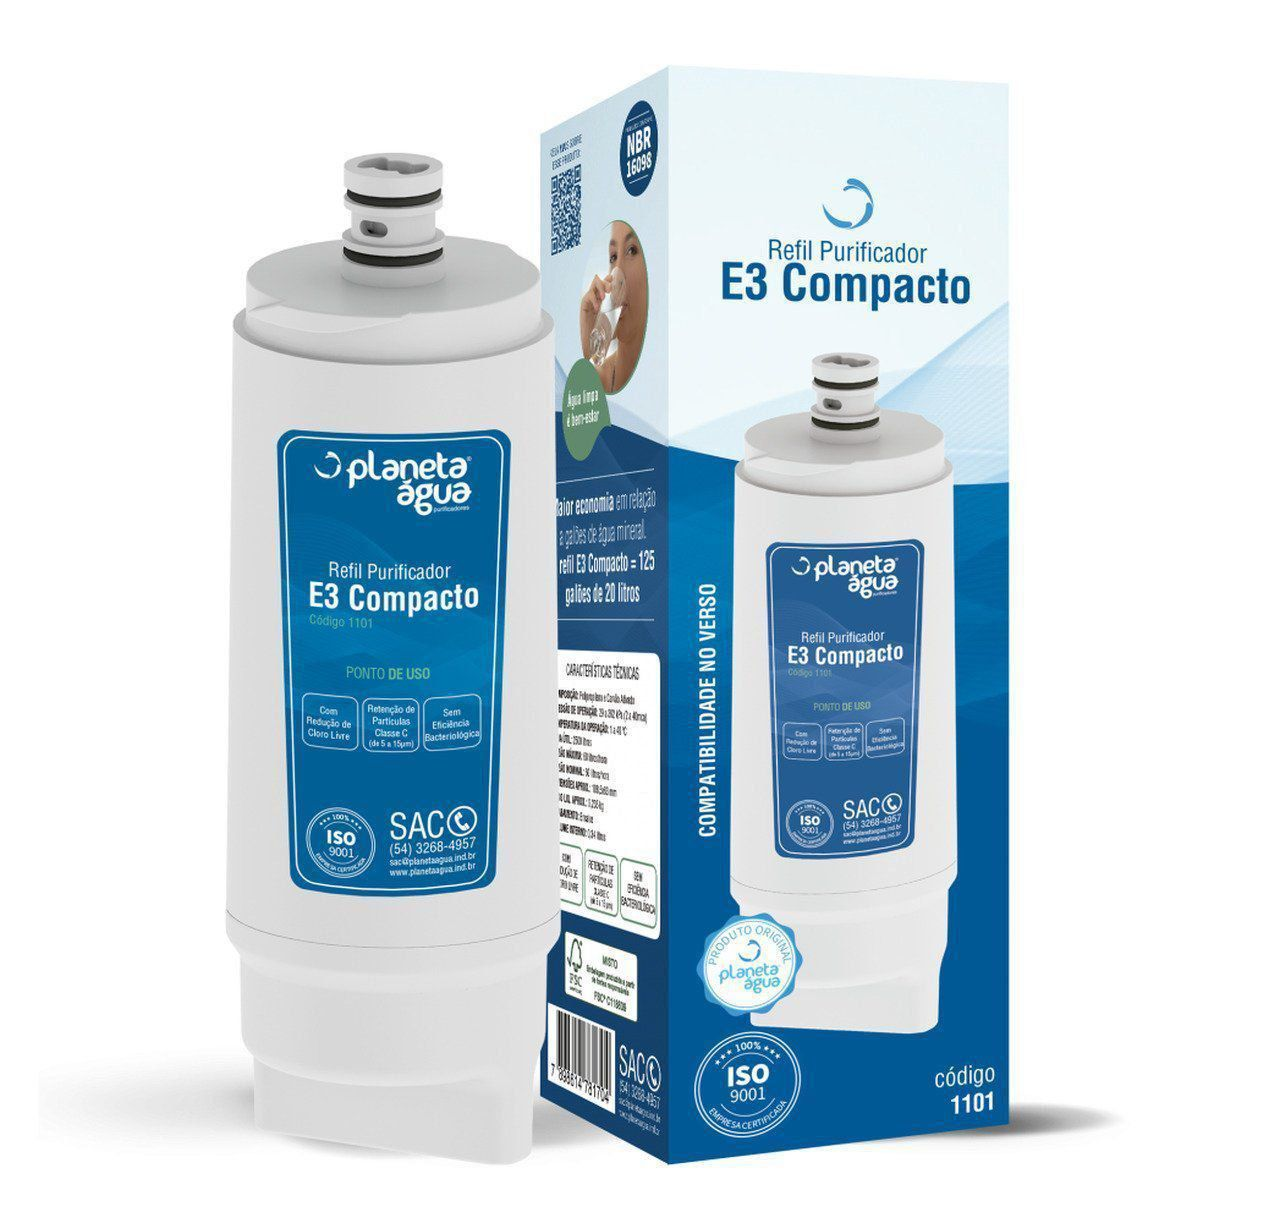 Refil Filtro Planeta Água E3 Compacto para Purificador de Água IBBL Avanti e MIO - Compatível